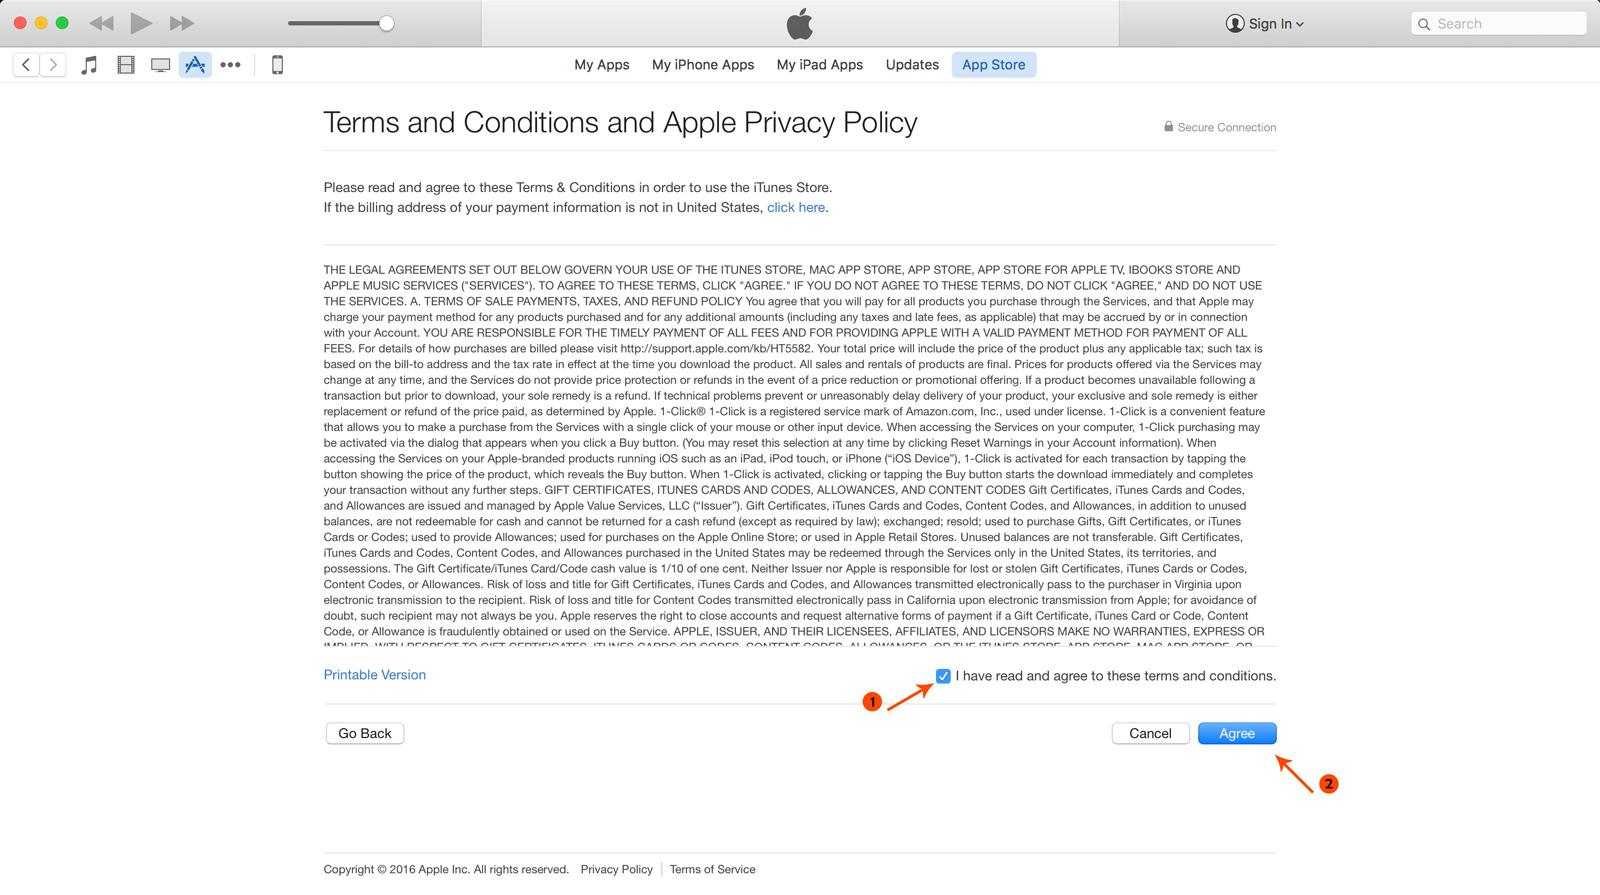 Apple ID 06 خرید اپل آیدی,خرید اپل آیدی ارزان,خرید اپل آیدی آماده